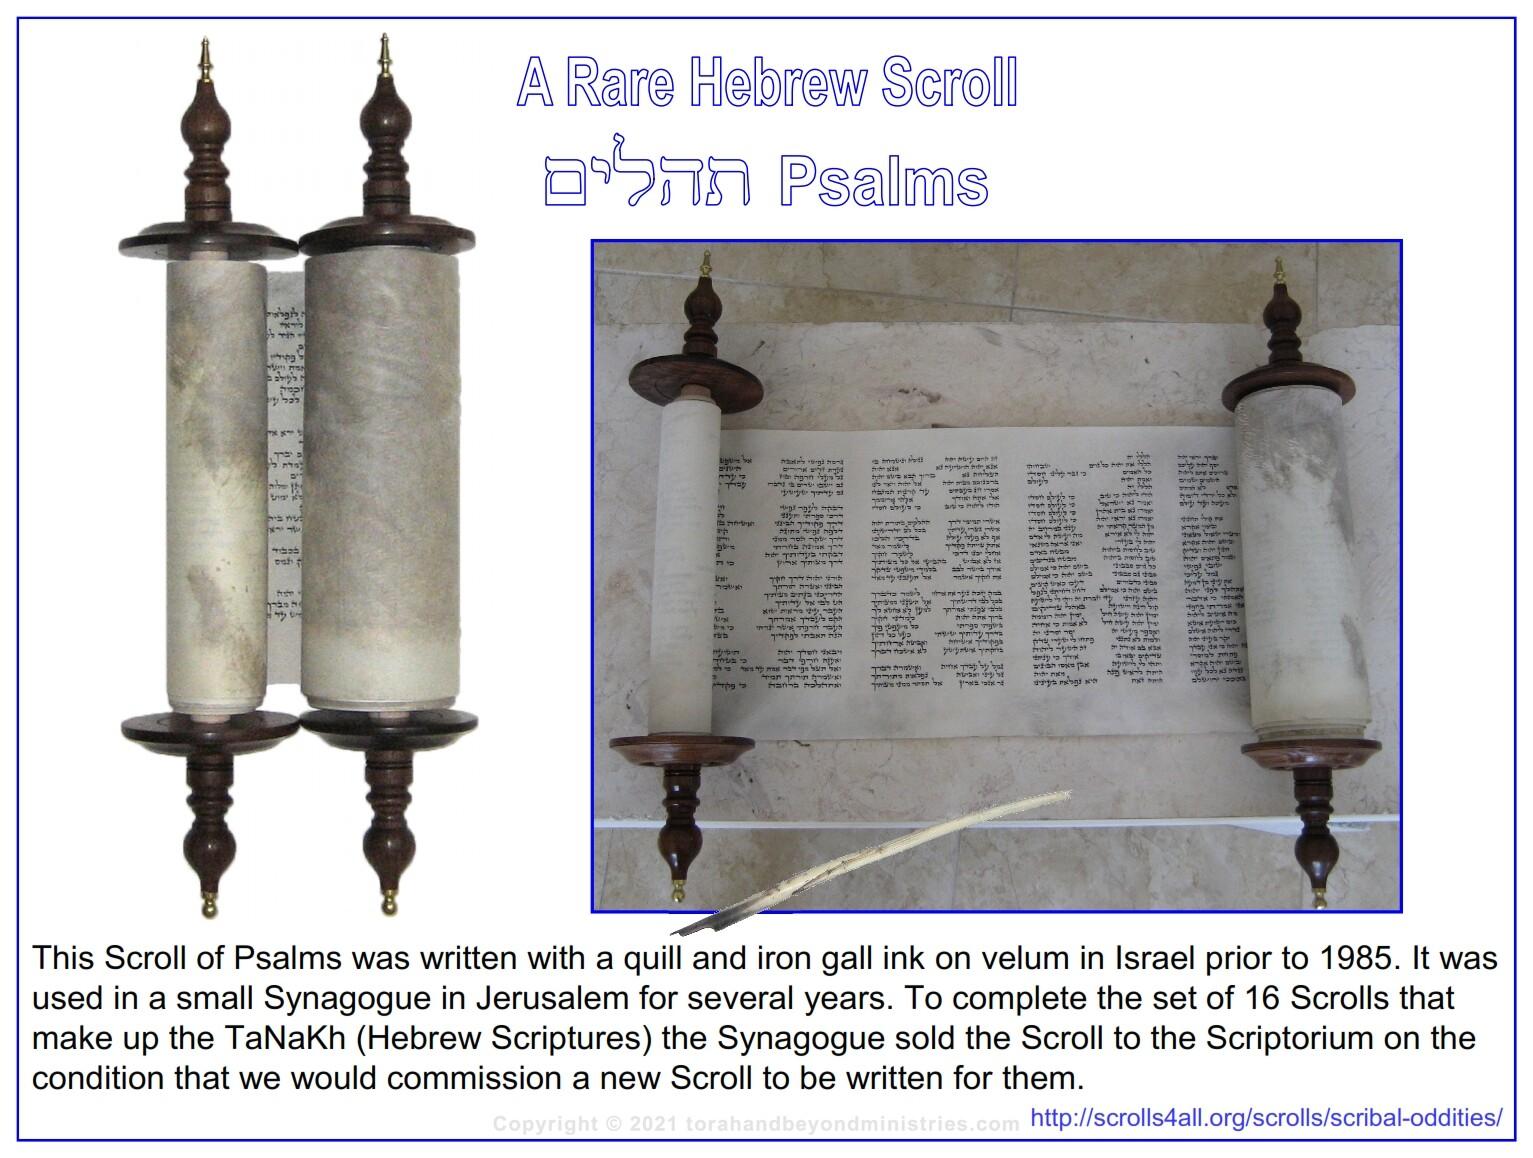 Psalms A 1 rare Scroll Psalms 2_001